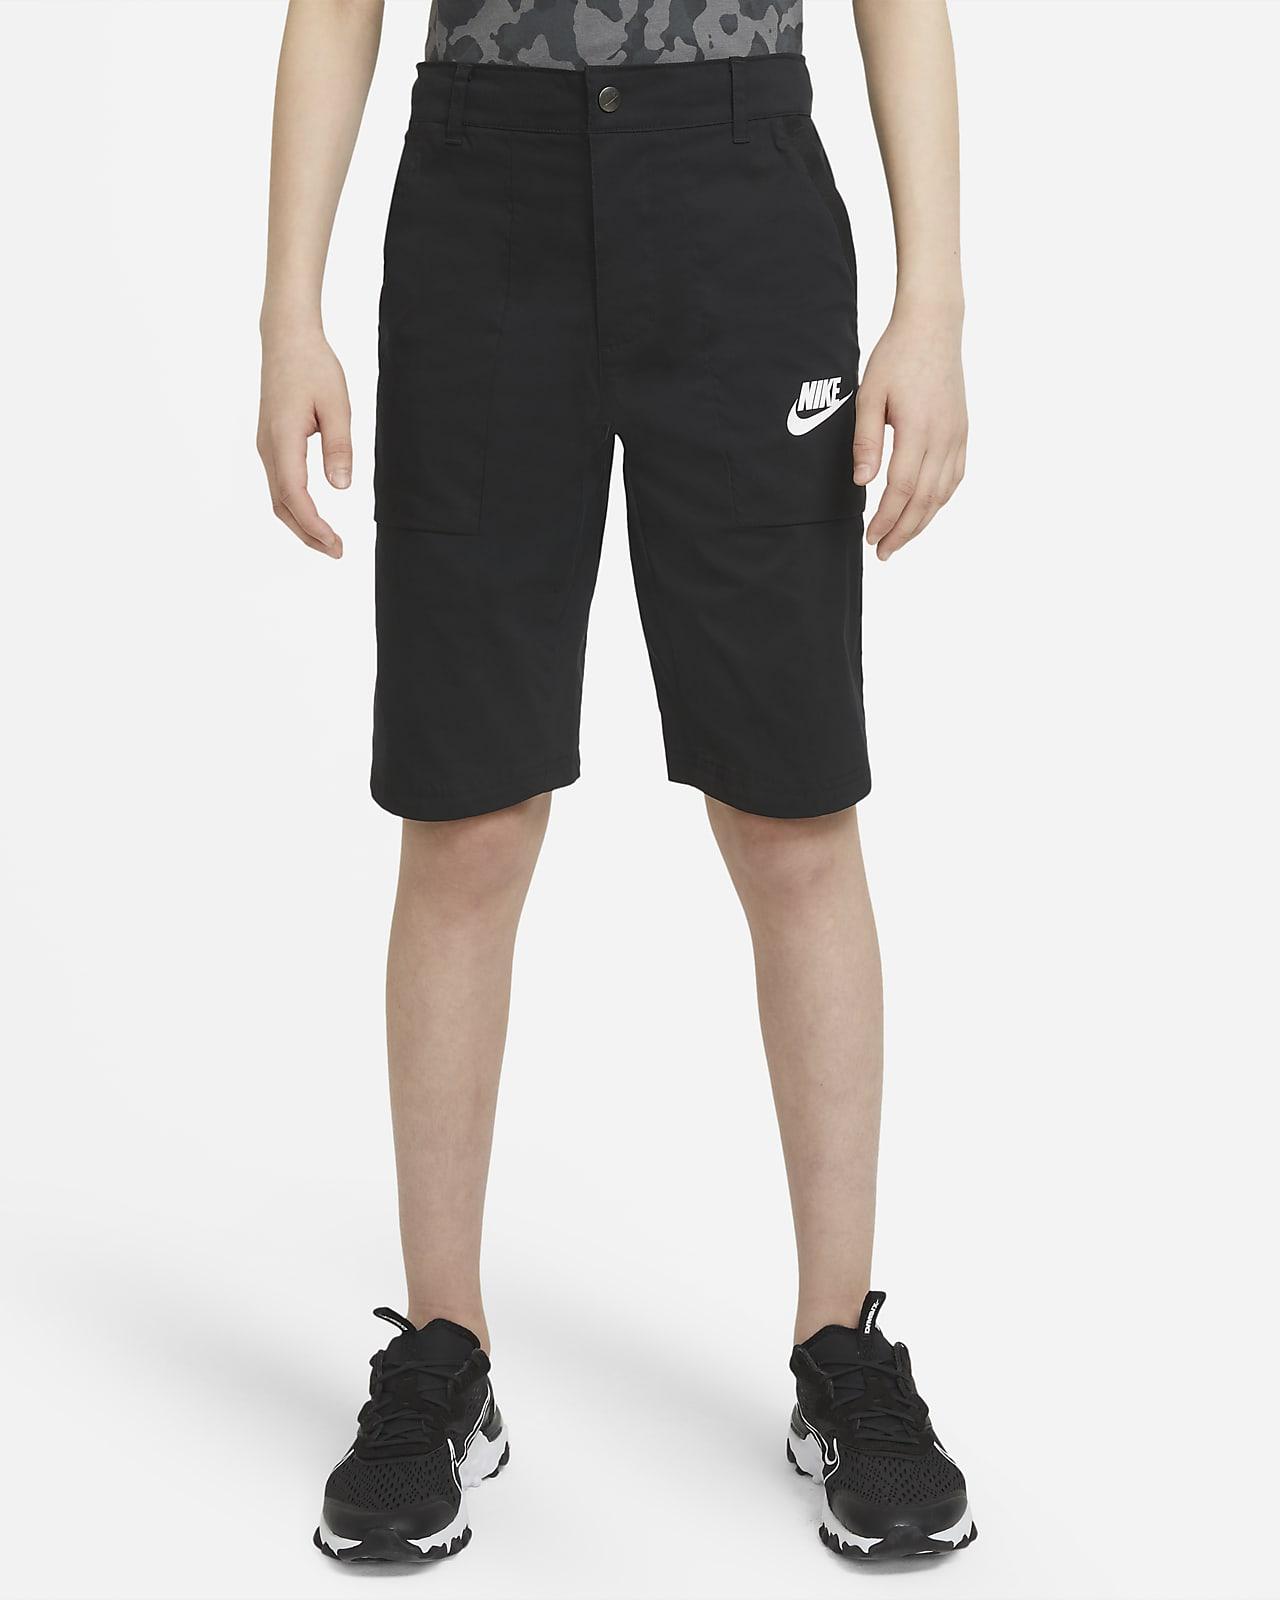 Cargoshorts Nike Sportswear för killar